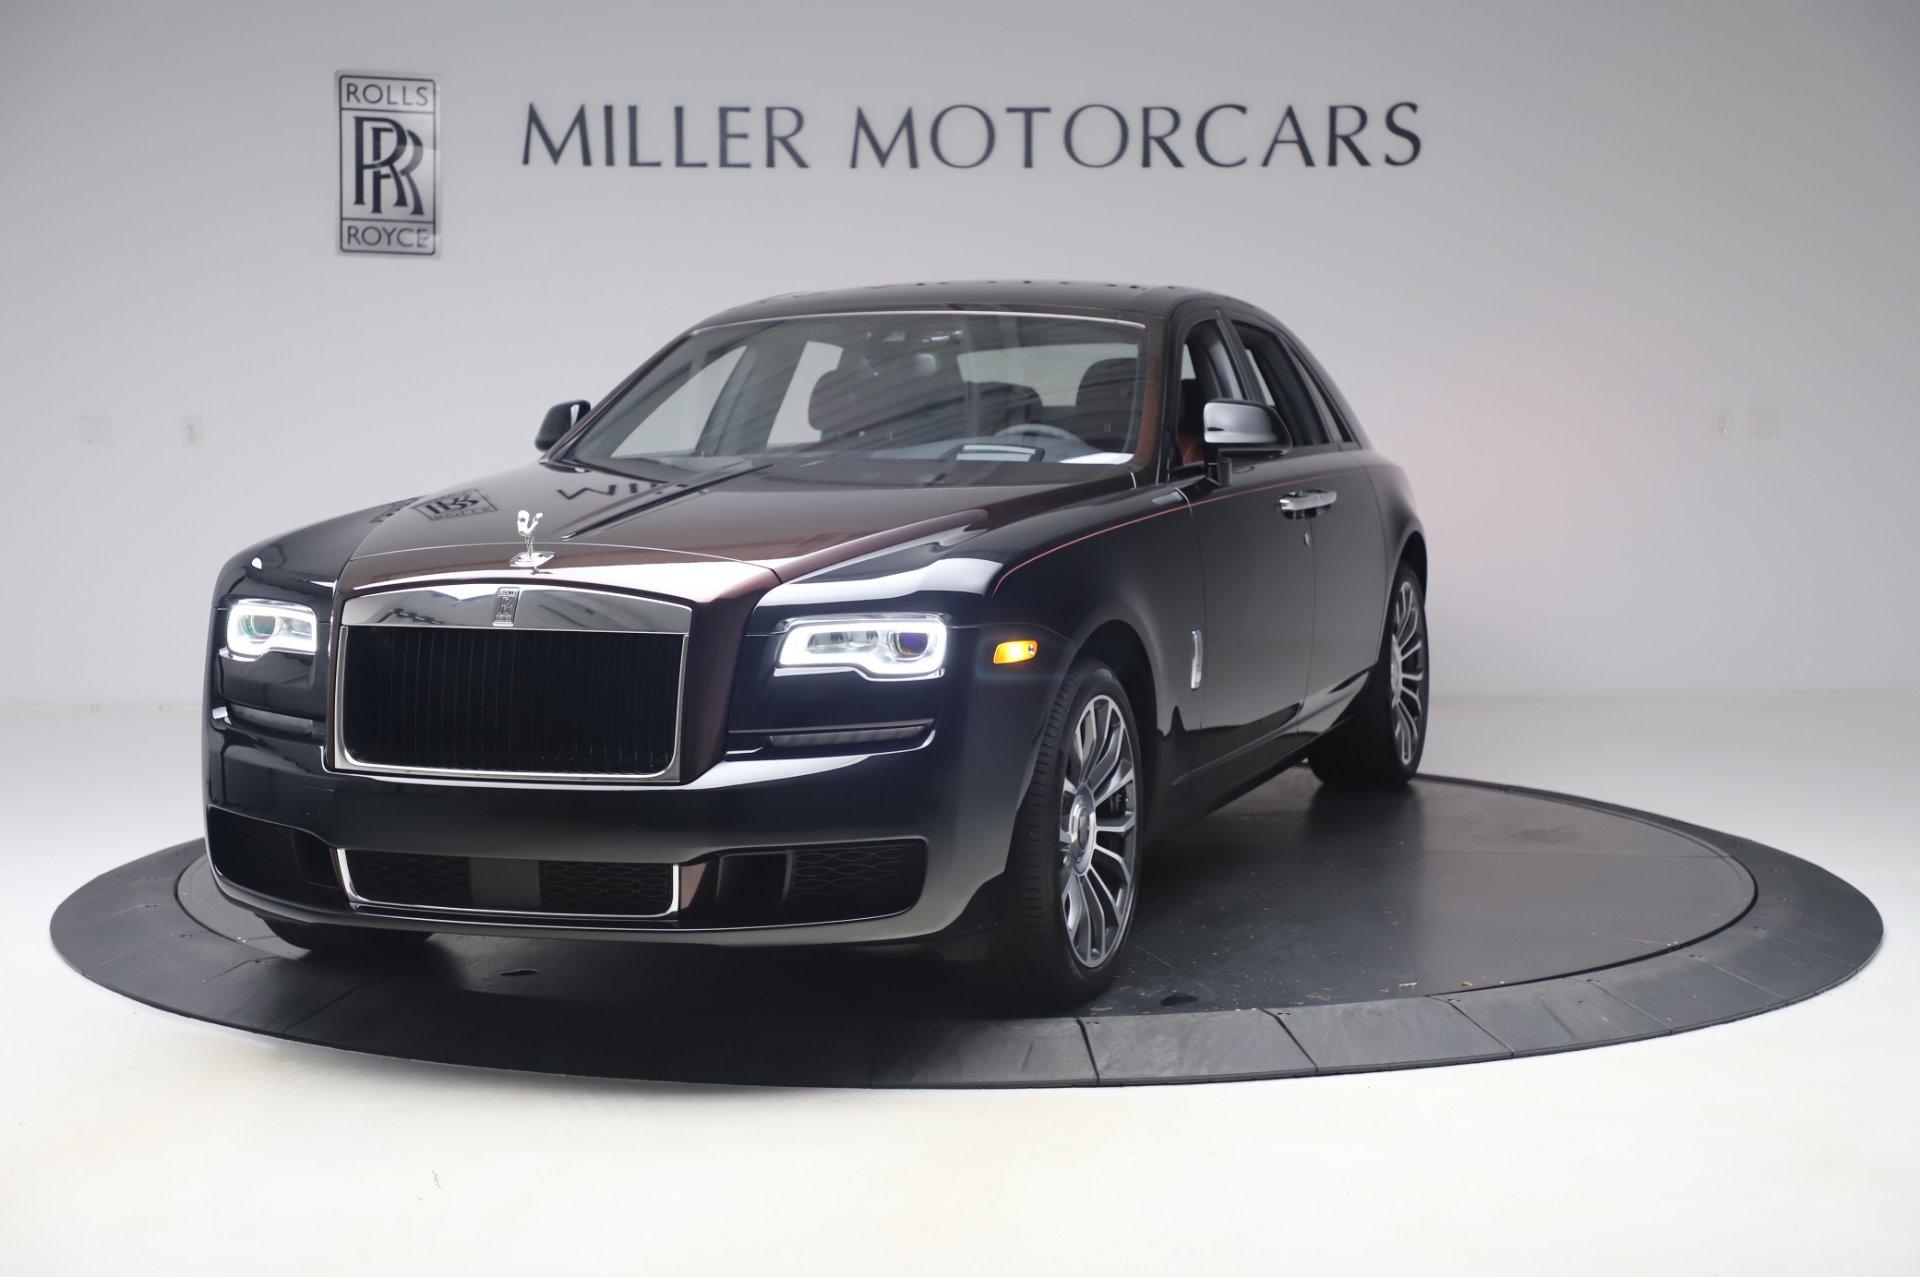 New 2020 Rolls-Royce Ghost for sale Sold at Alfa Romeo of Westport in Westport CT 06880 1